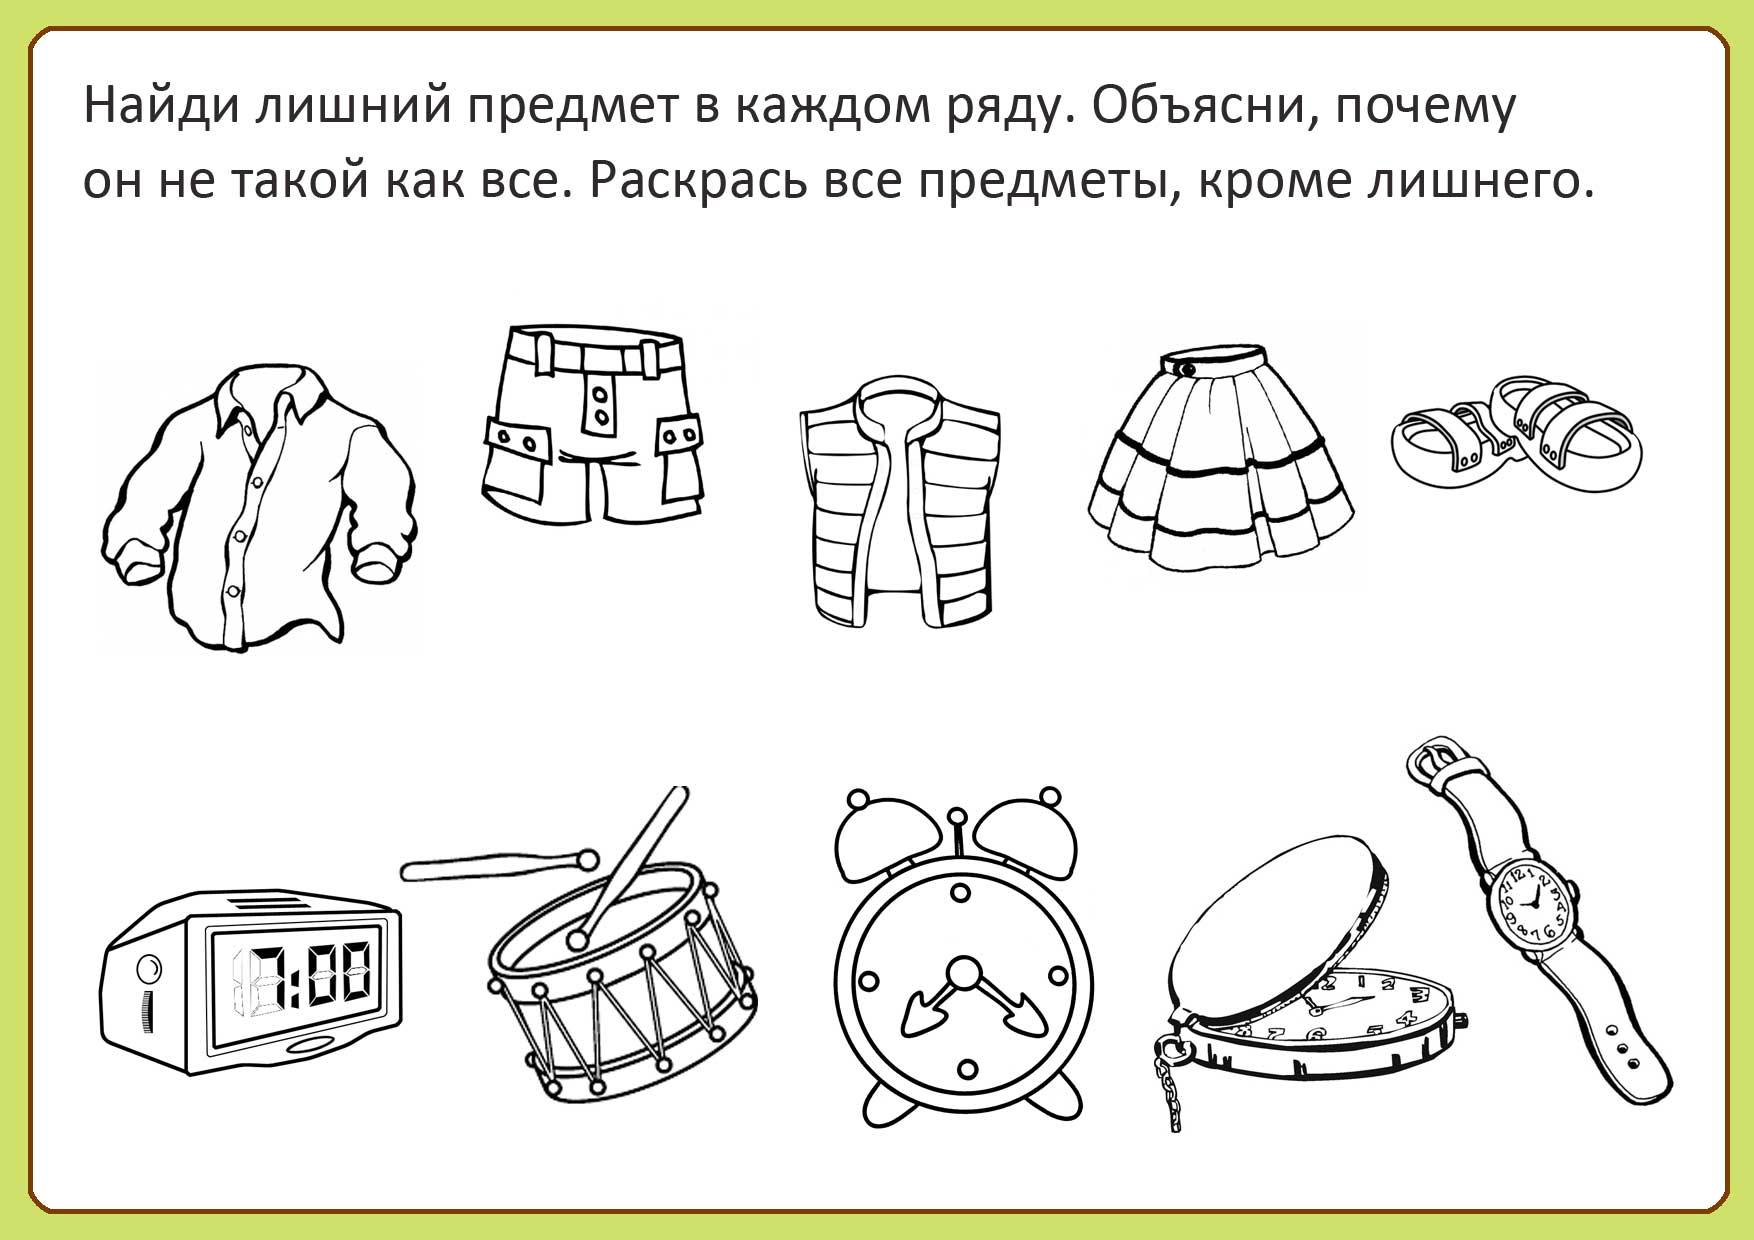 Задача Льва Толстого про шапку  Задачи  Разминка для мозгов